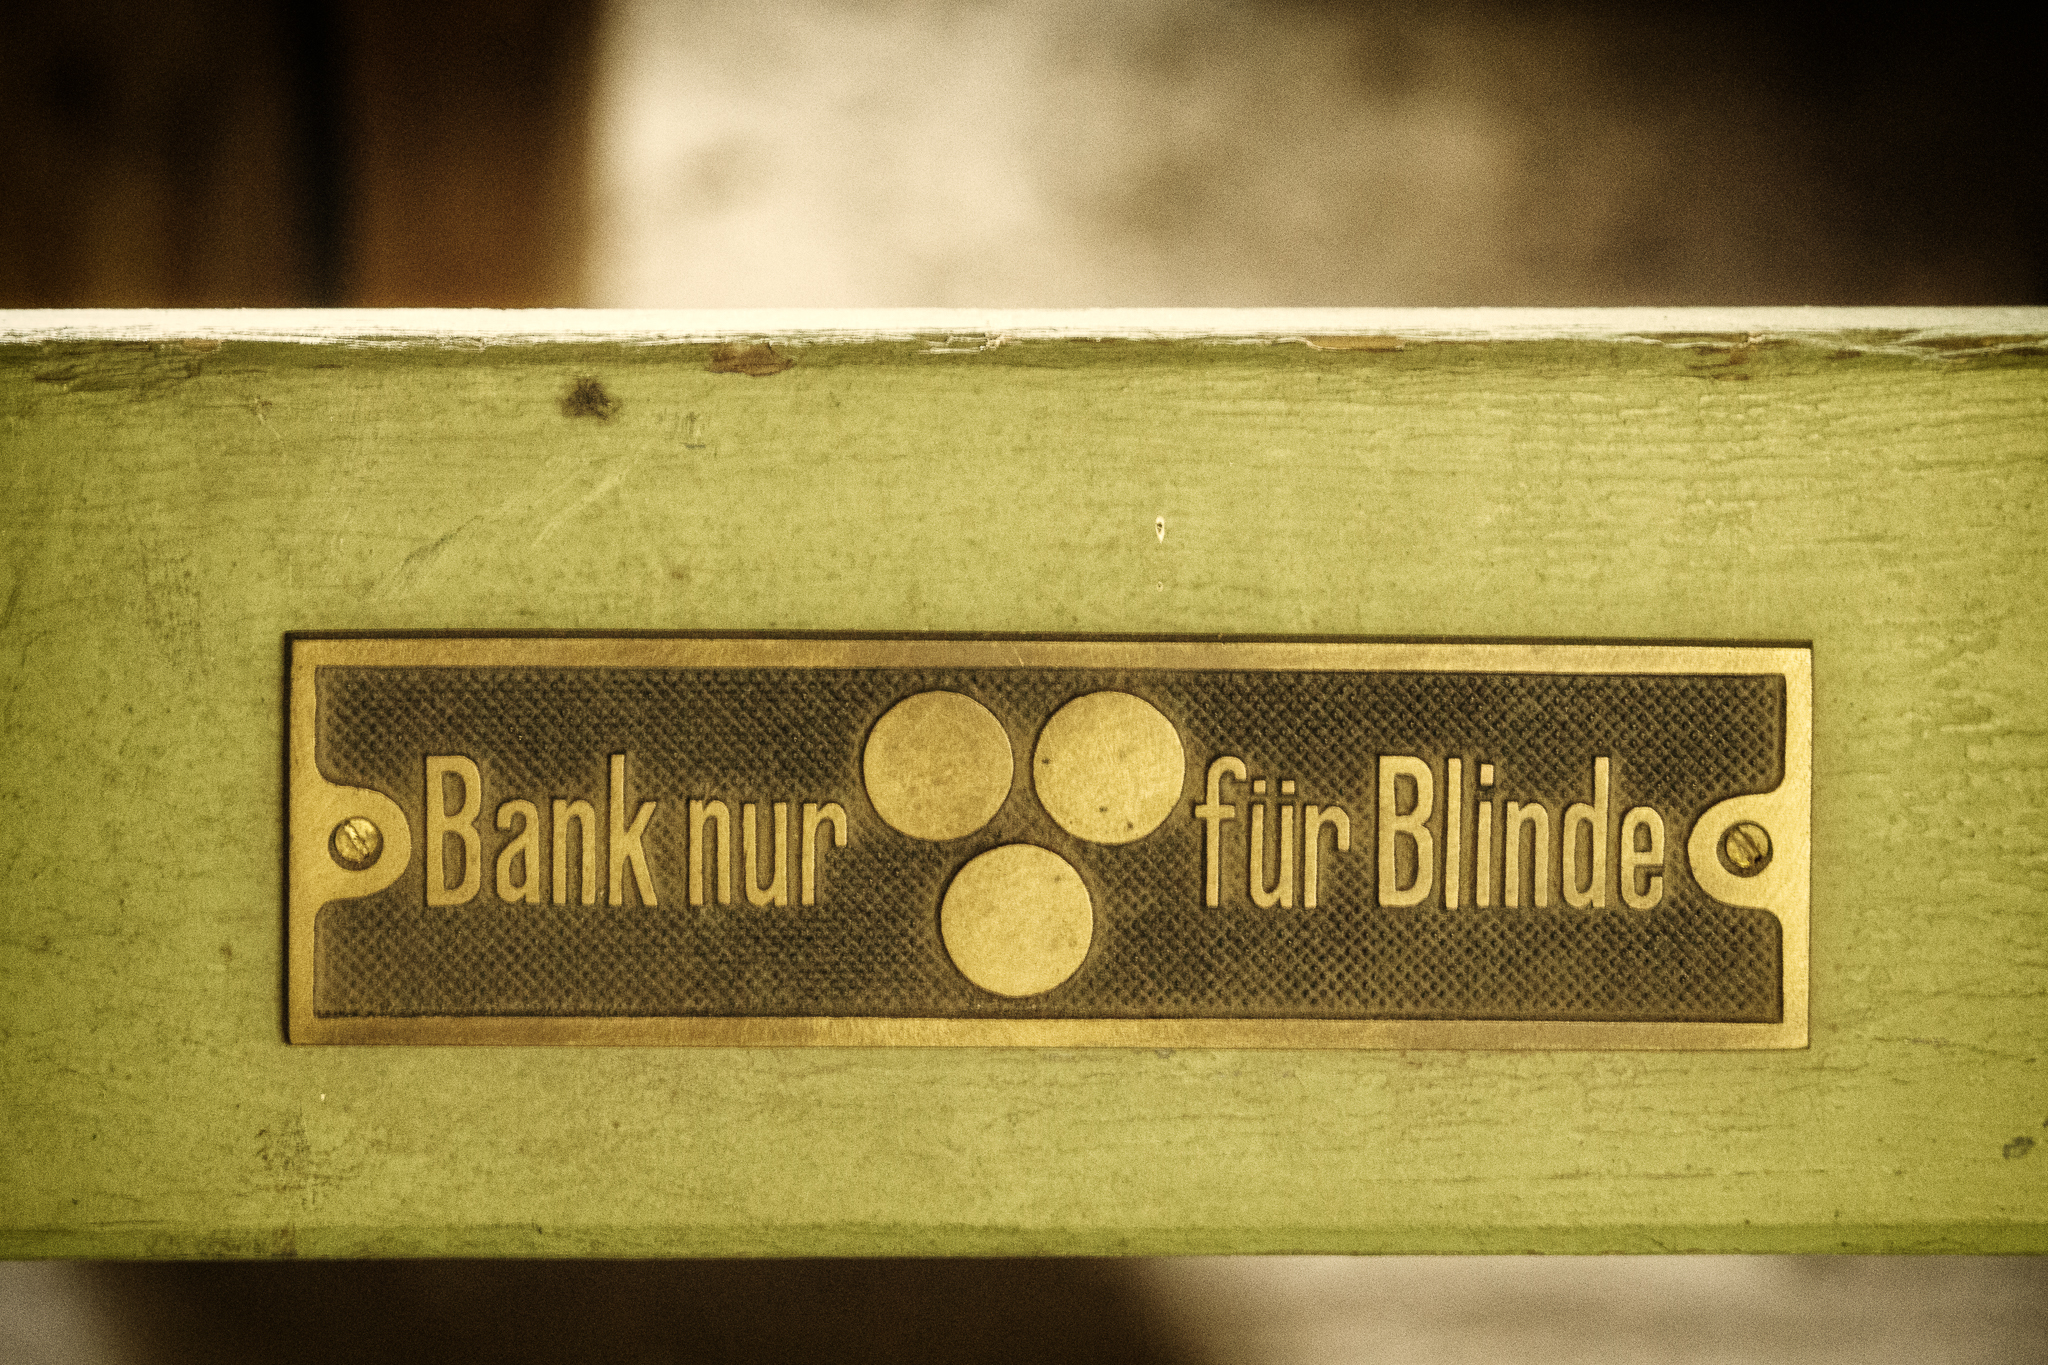 Bankregeln